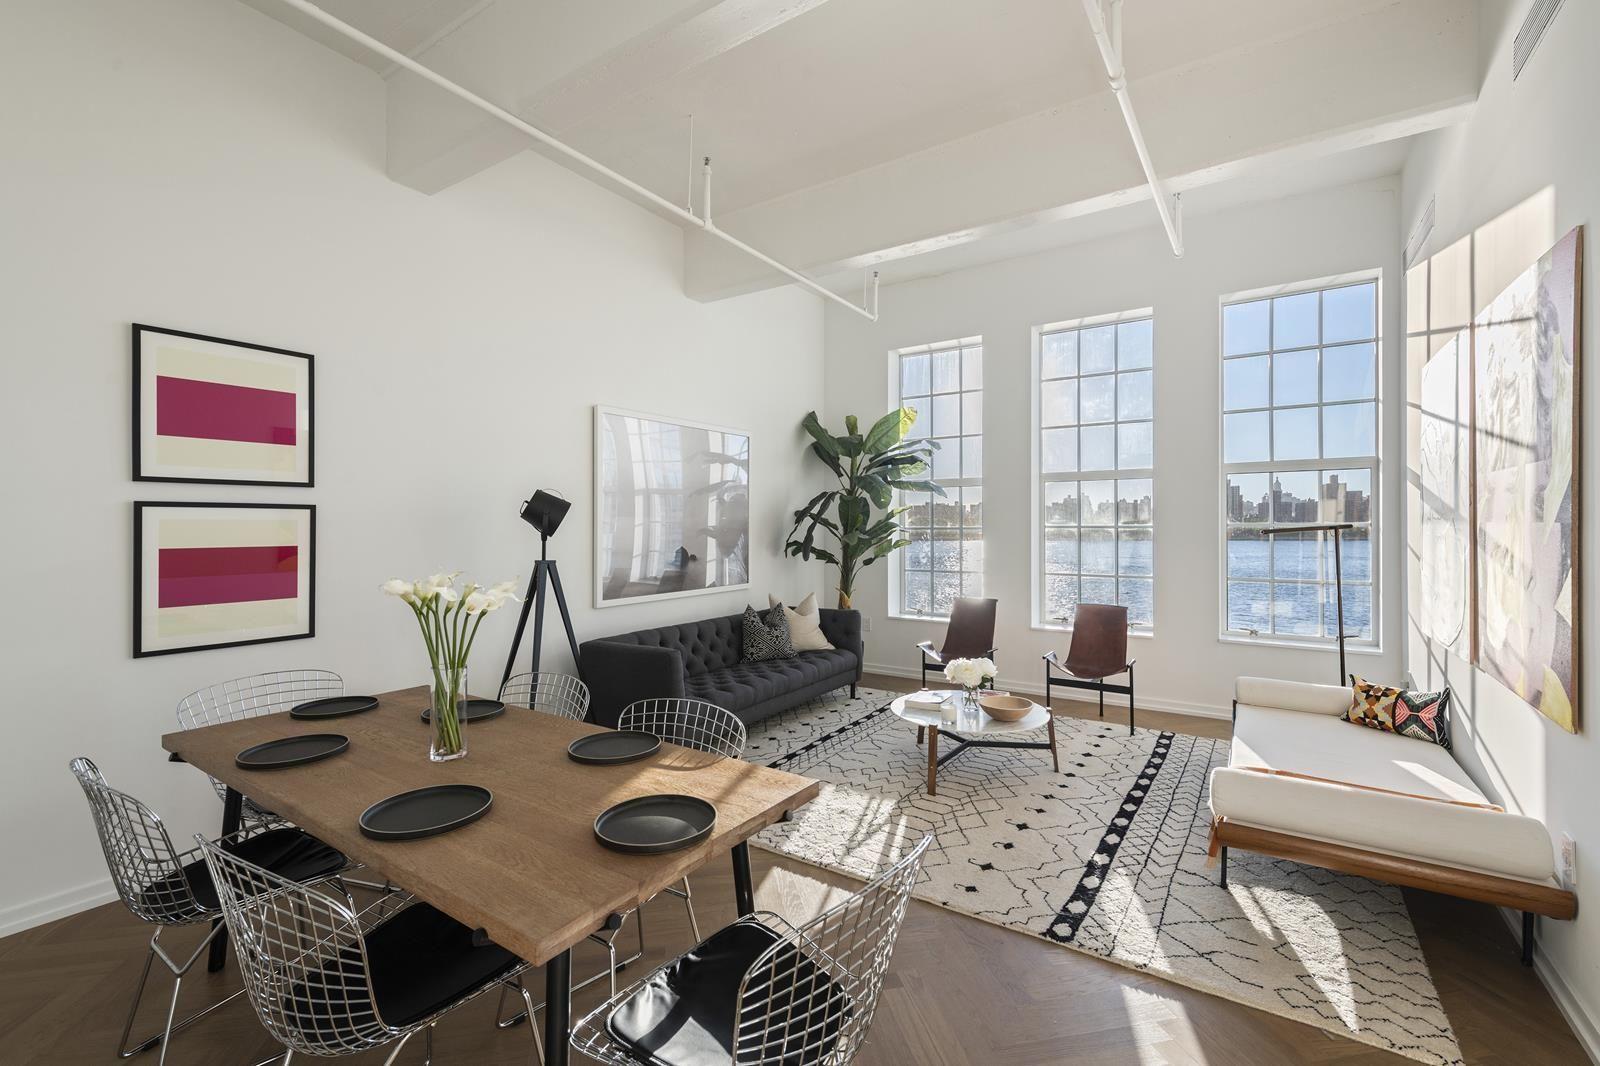 Apartment for sale at 184 Kent Avenue, Apt B-301